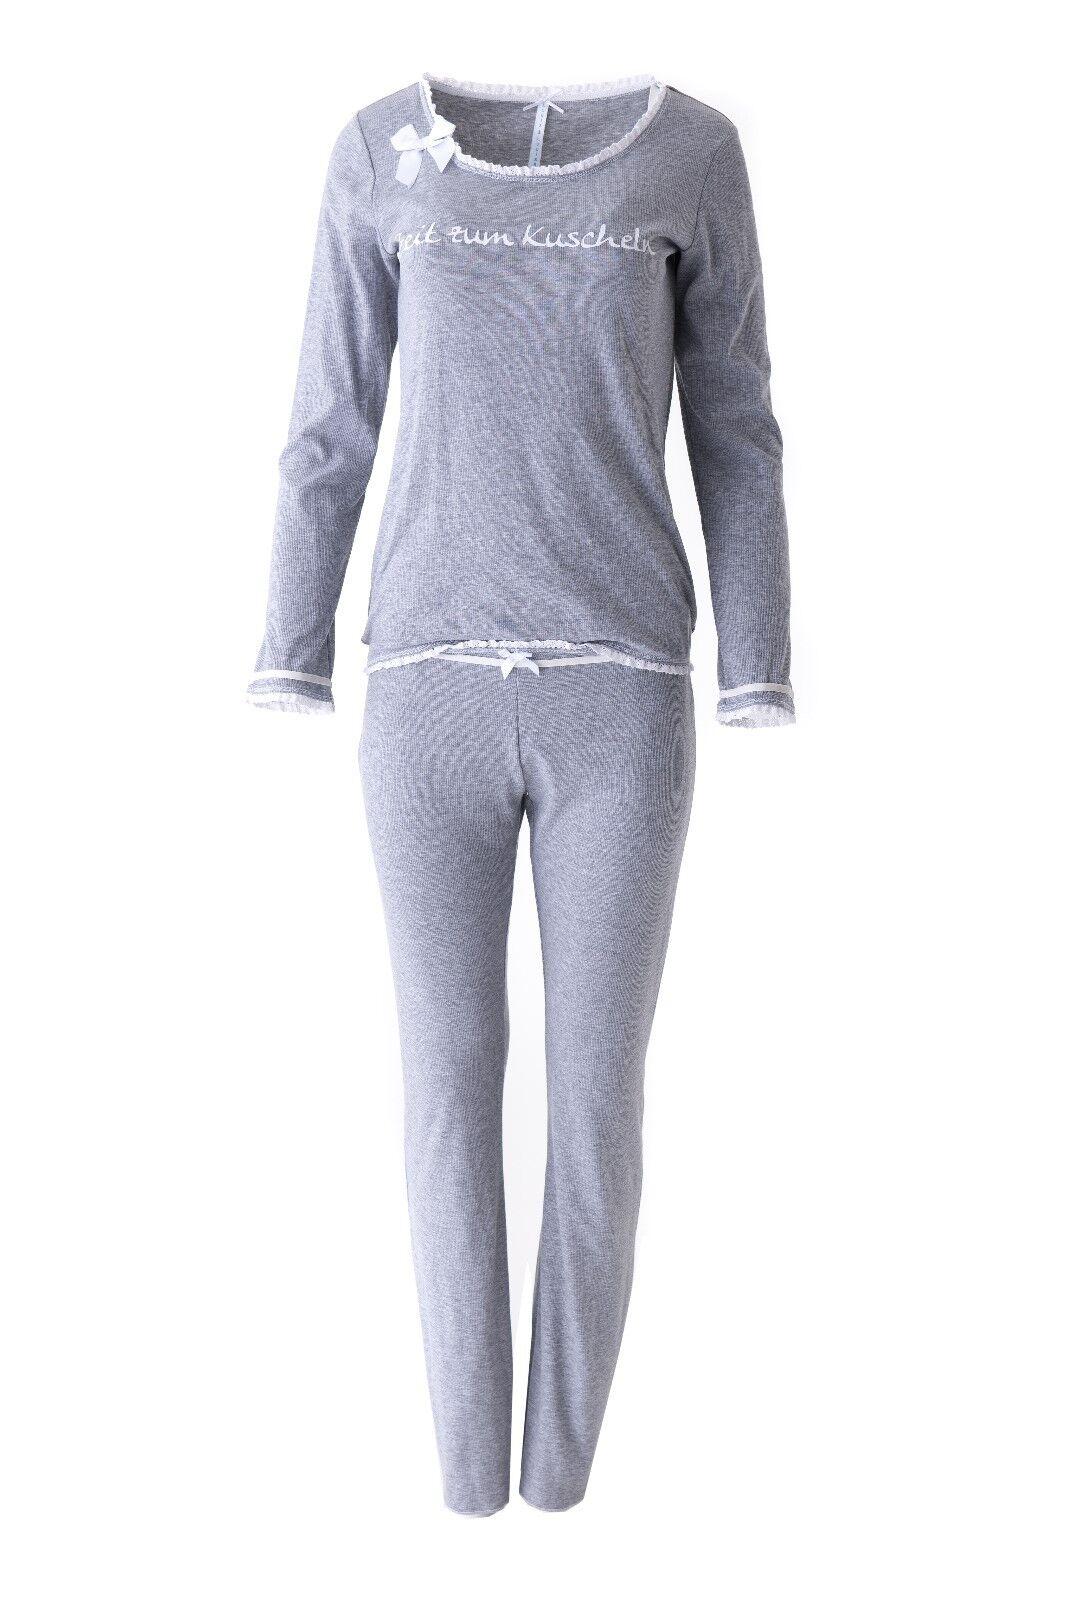 LOUIS & LOUISA   Zeit zum Kuscheln   Pyjama Rippe grey & Spitze Gr.S - XXL NEU